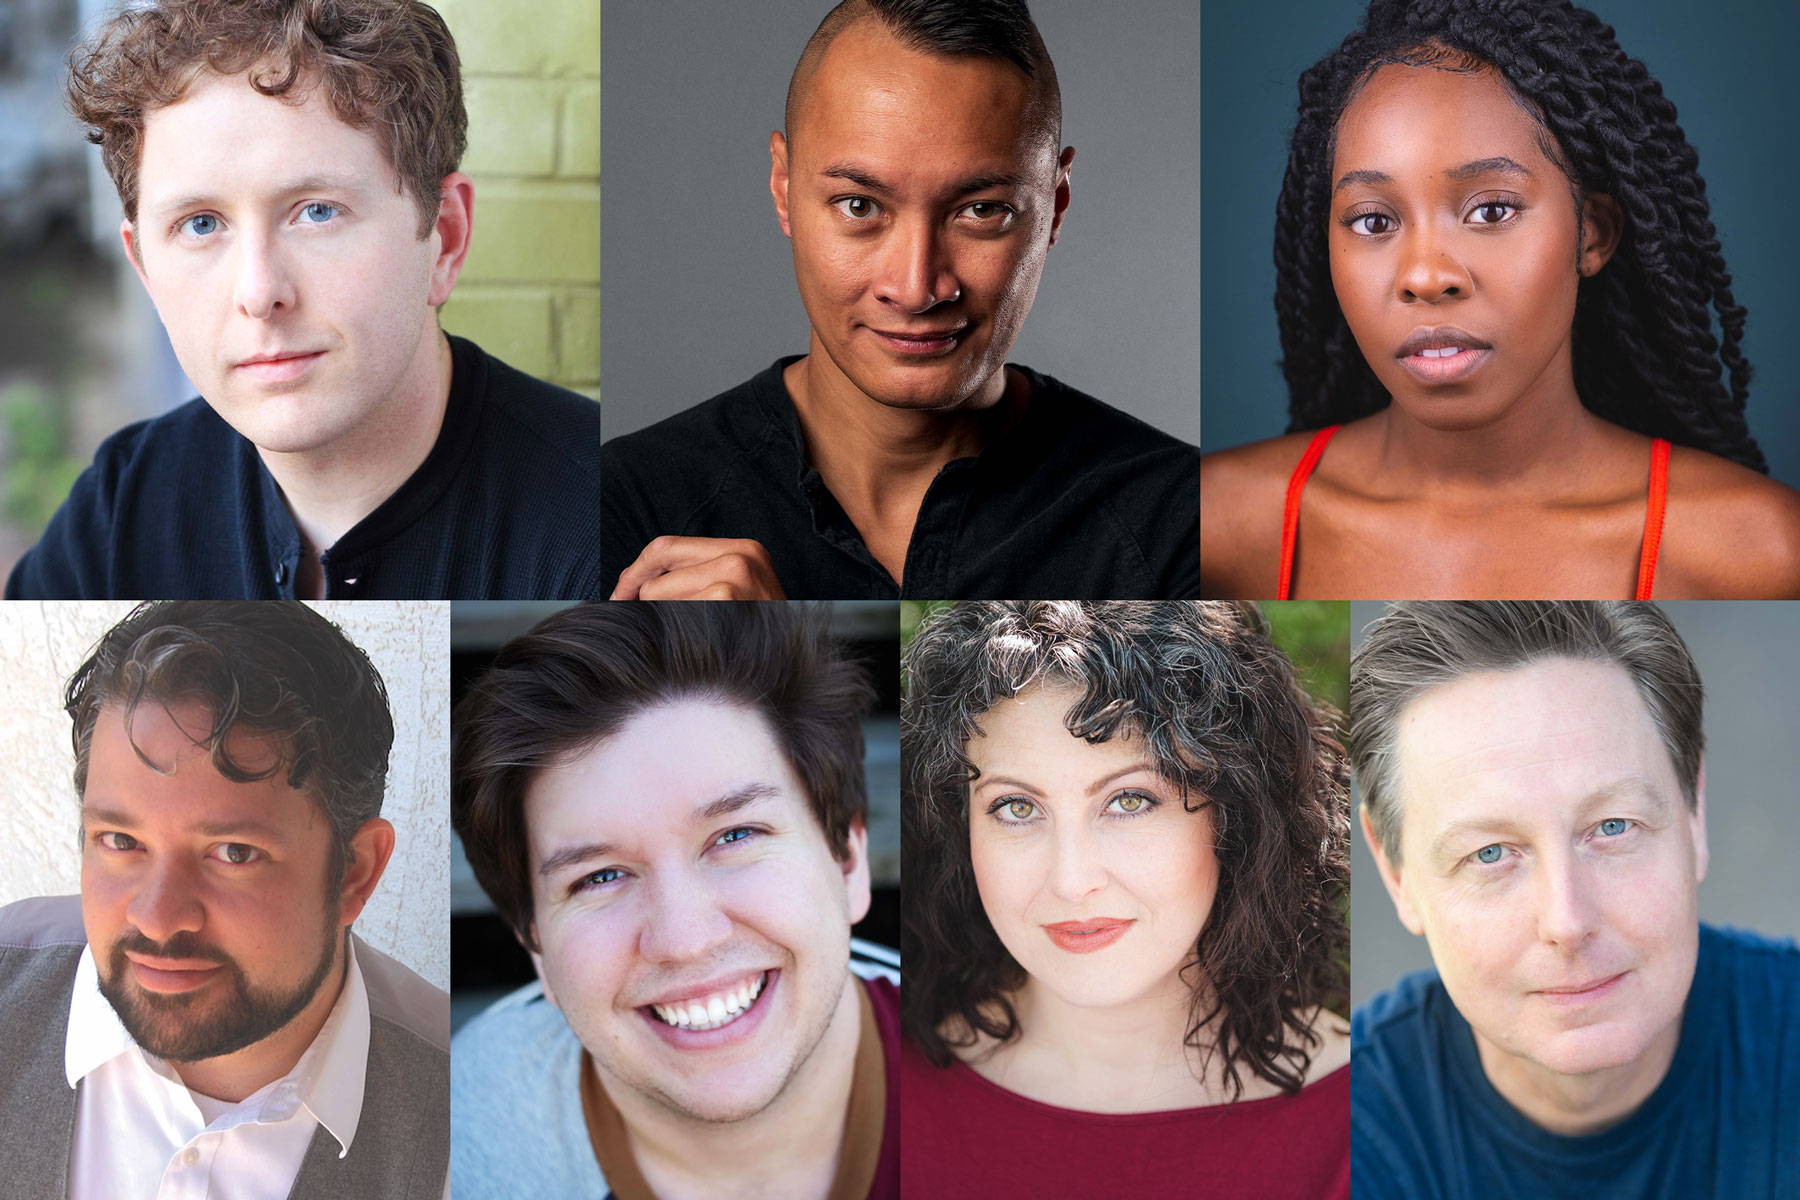 Barter Theatre Frankenstein Cast (See Image Description)